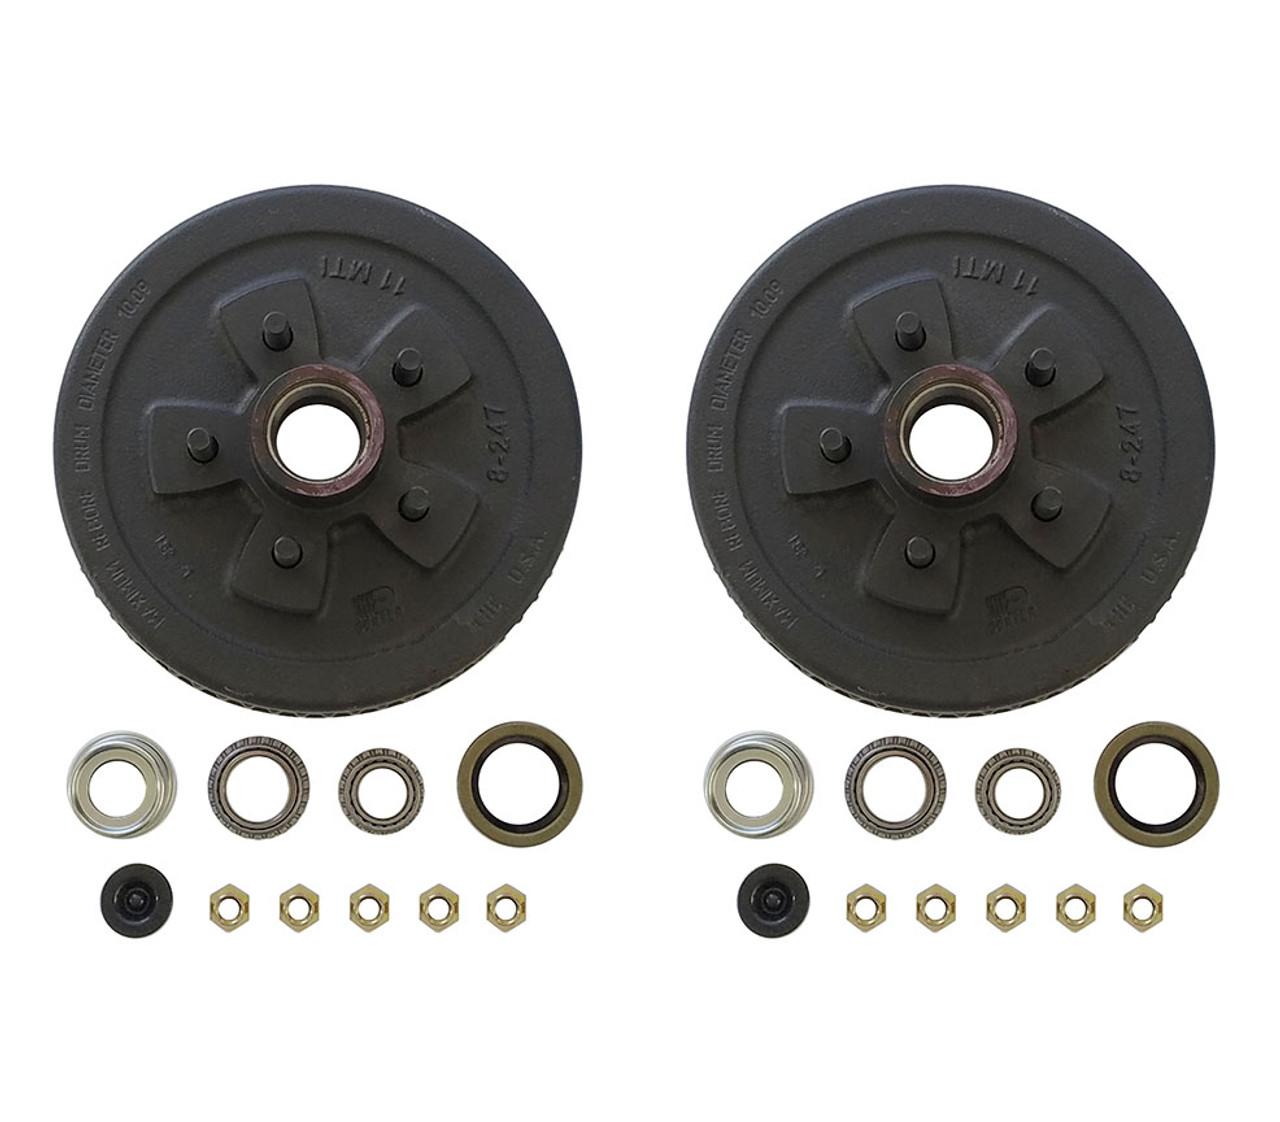 "545UHI-HDEZ --- 5 on 4-1/2"" Hub and Drum Assembly for 10"" Brakes - Pair - 3,500 lb - Ez Lube"